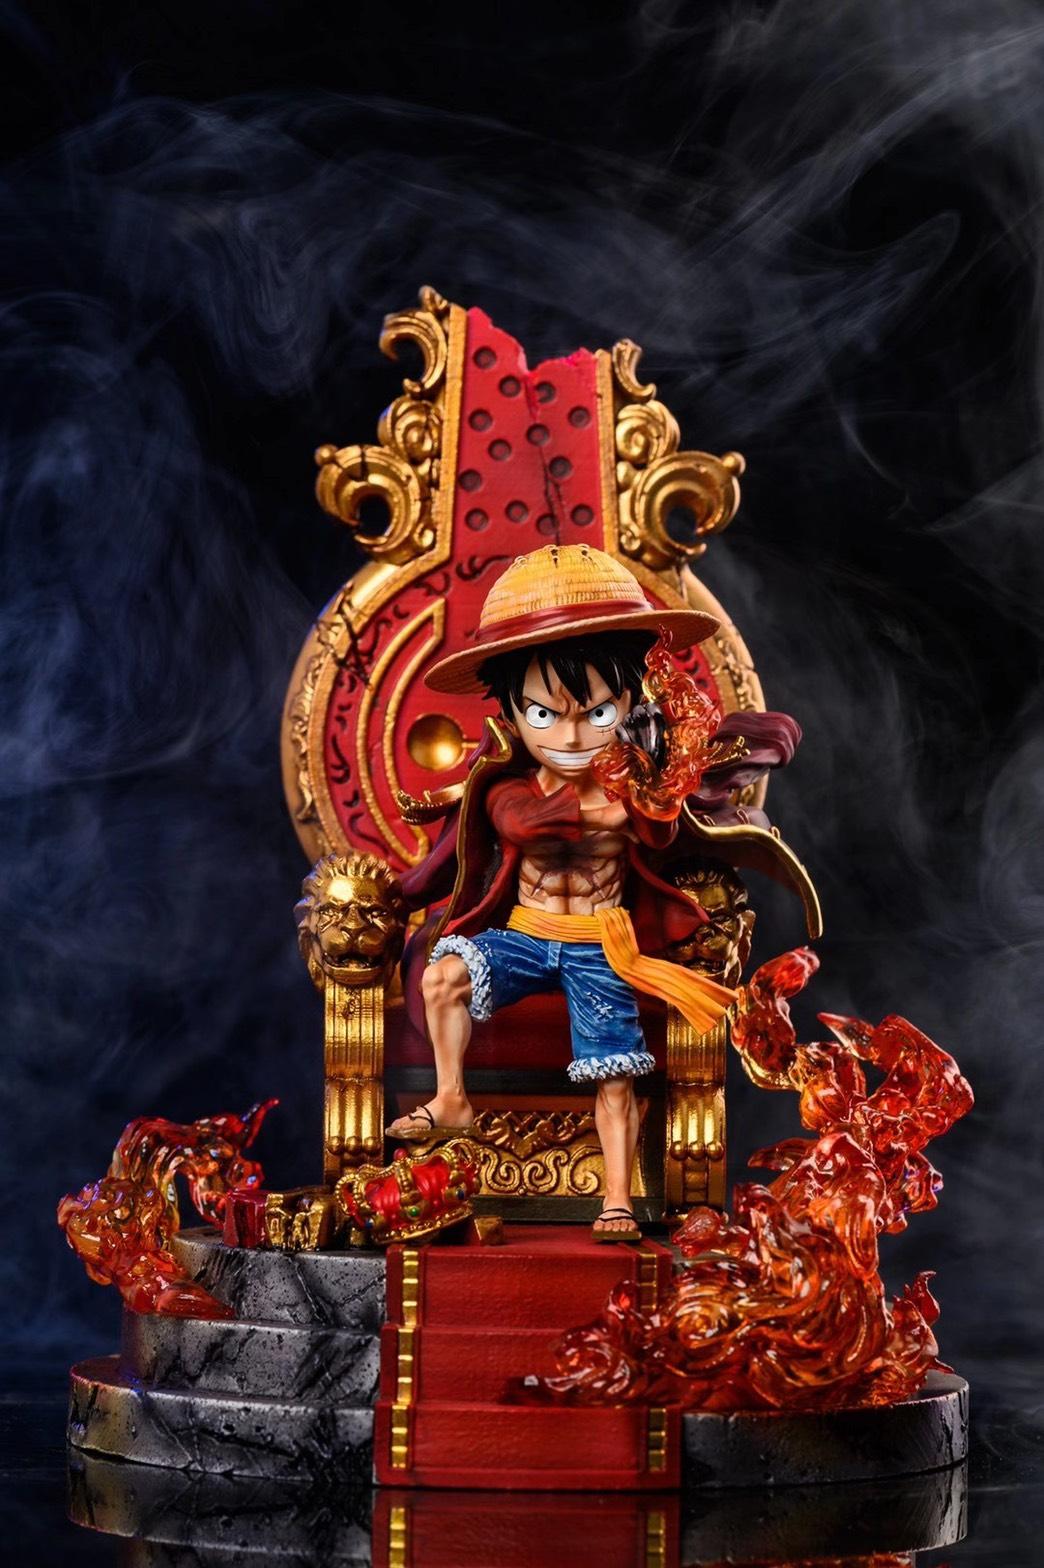 Luffy ลูฟี่ จักพรรดิ G5 Studio (มัดจำ) [[SOLD OUT]]